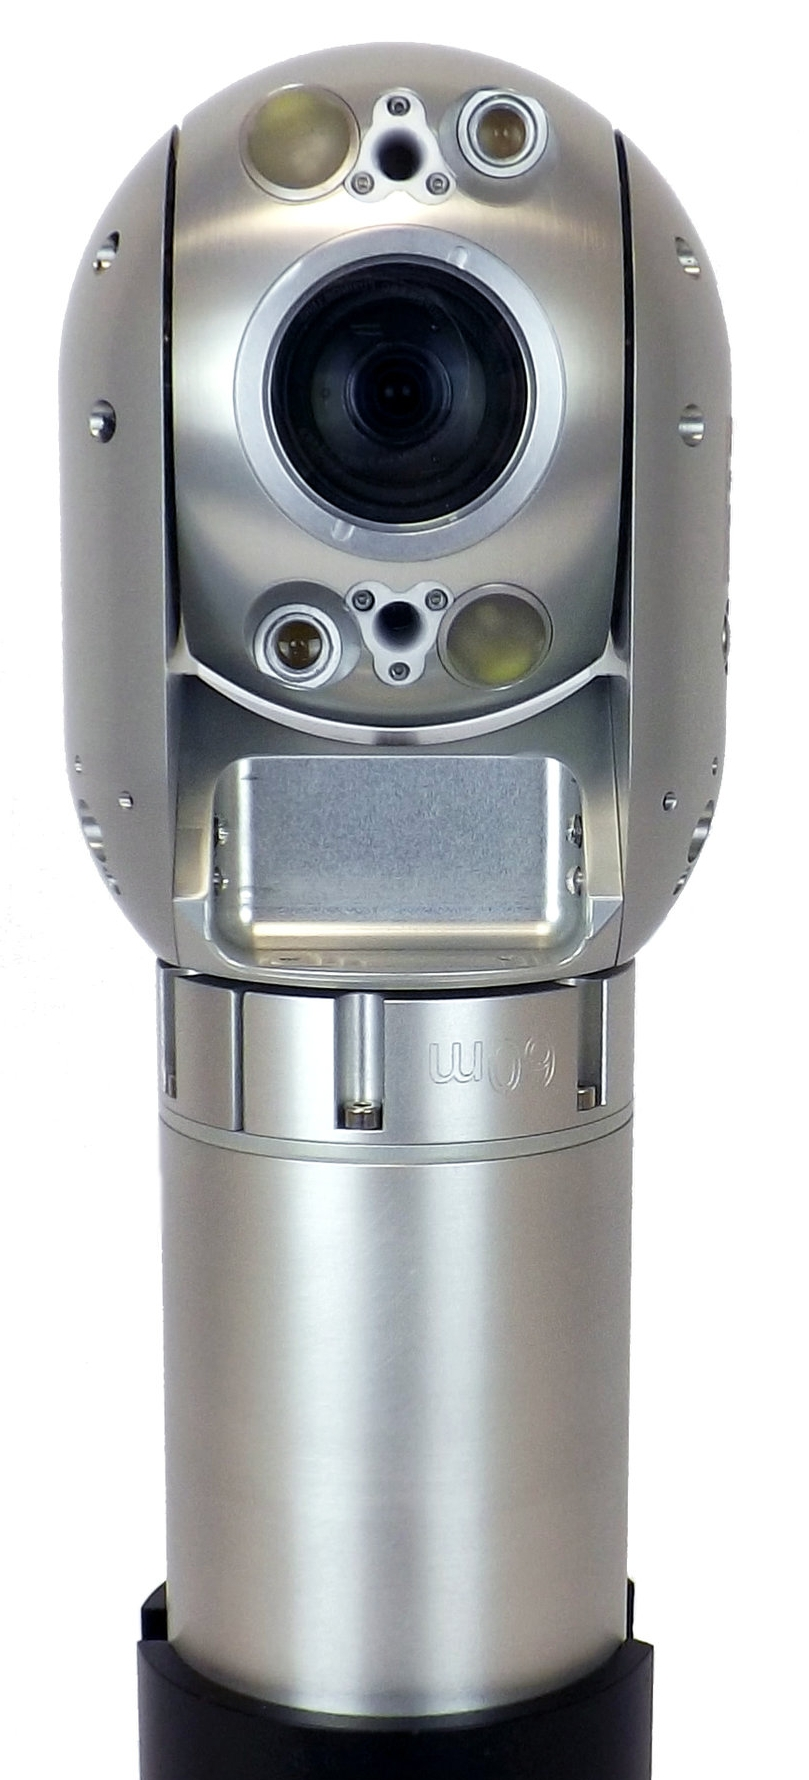 Spectrum 120HD™ PTZ camera